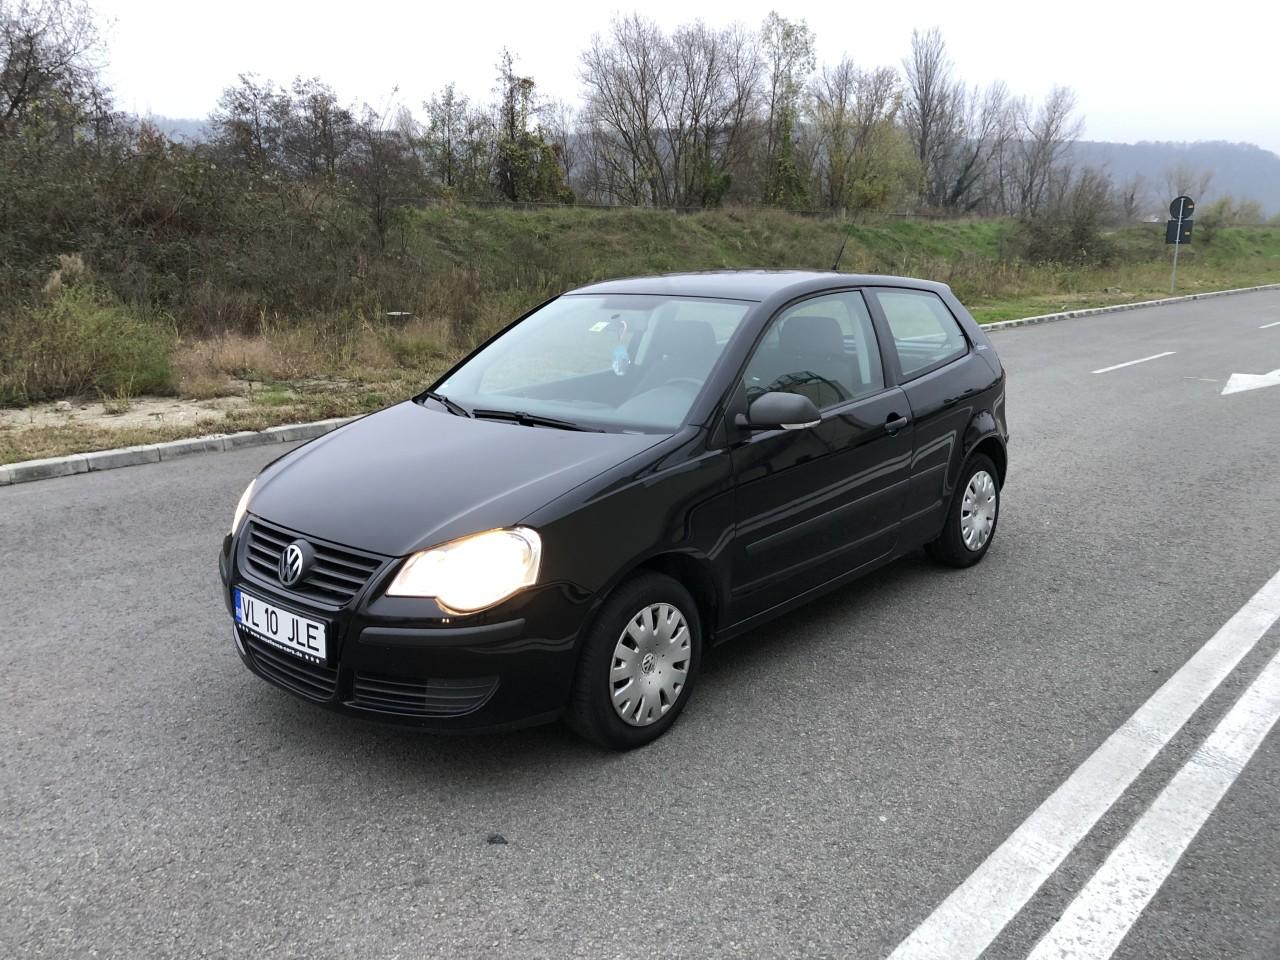 VW Polo 1.4 TDI 2007